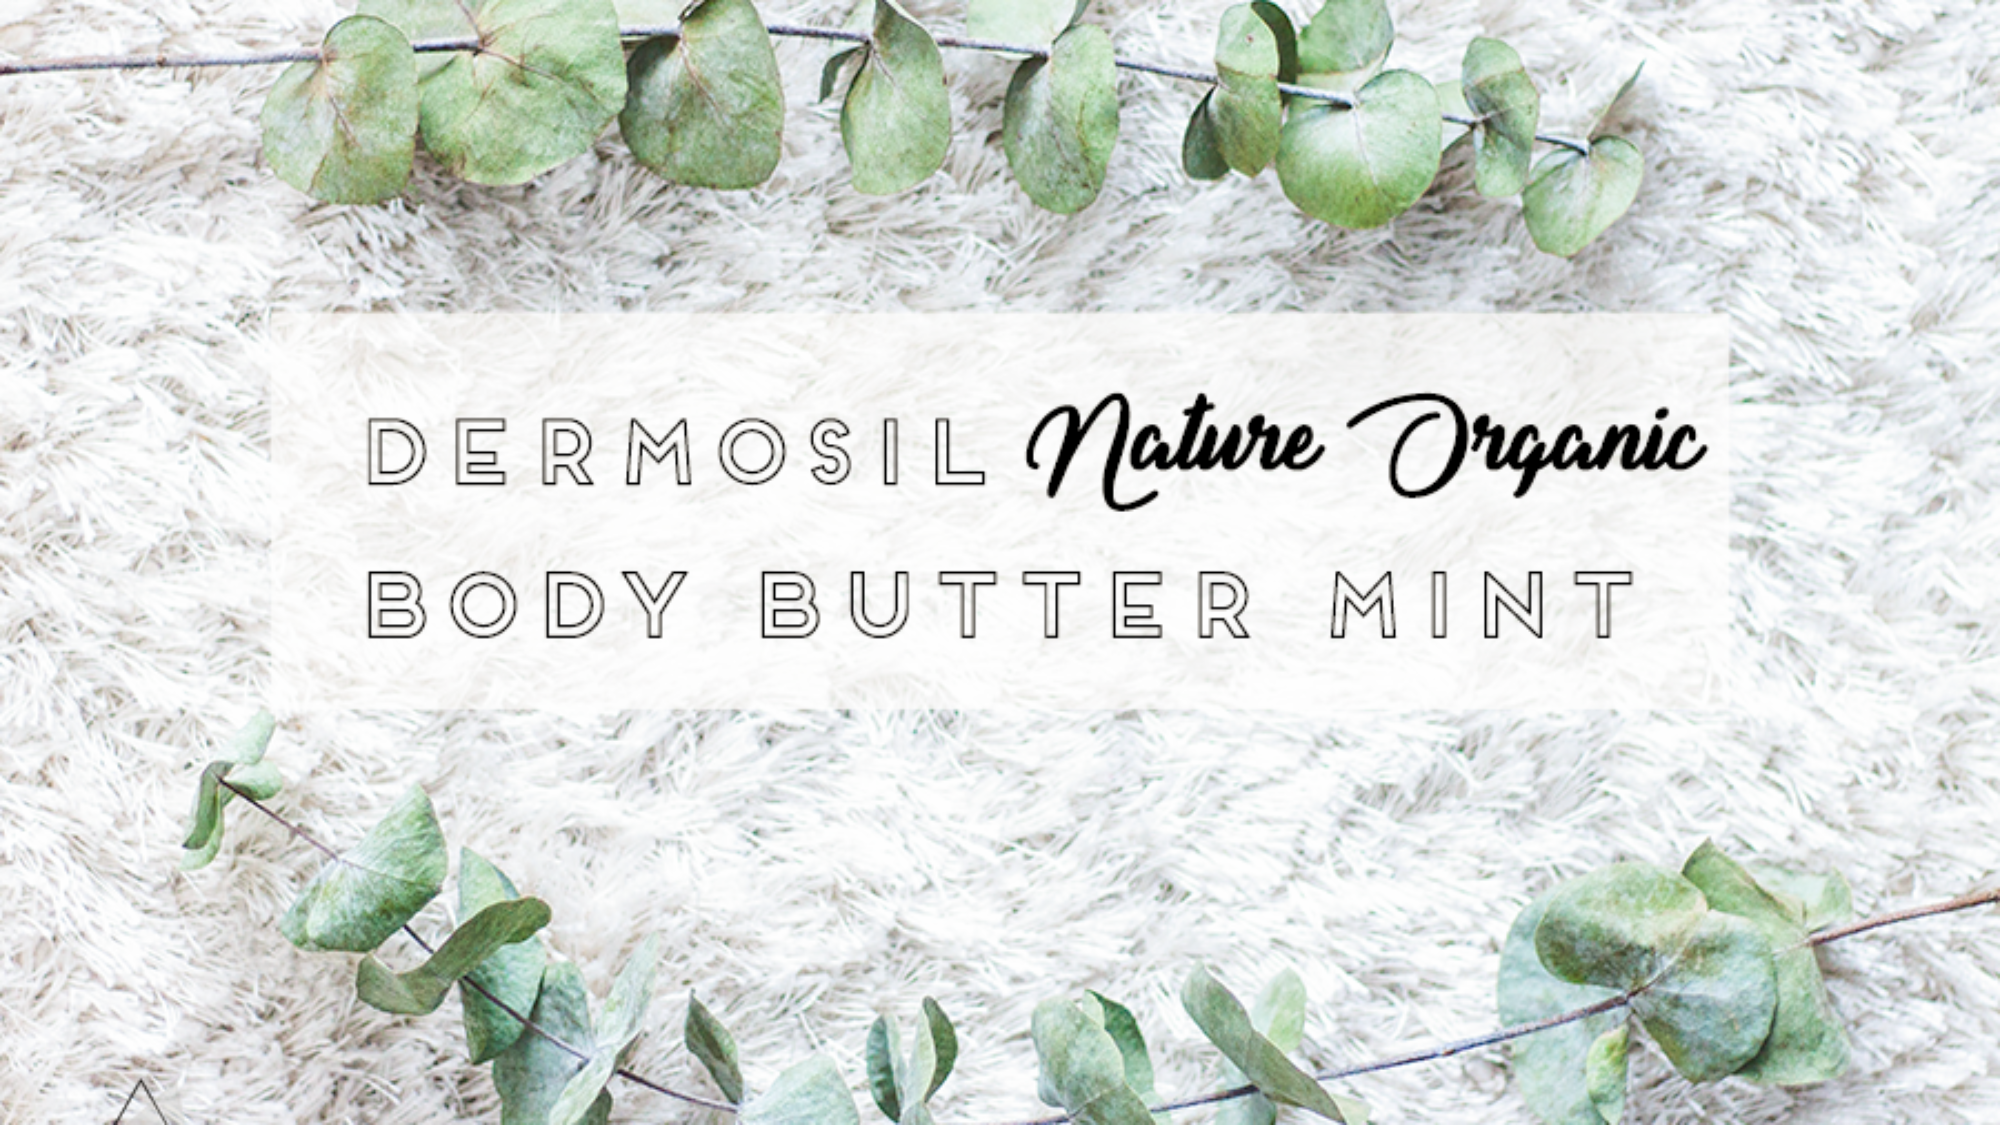 Dermosil Body Butter teksti